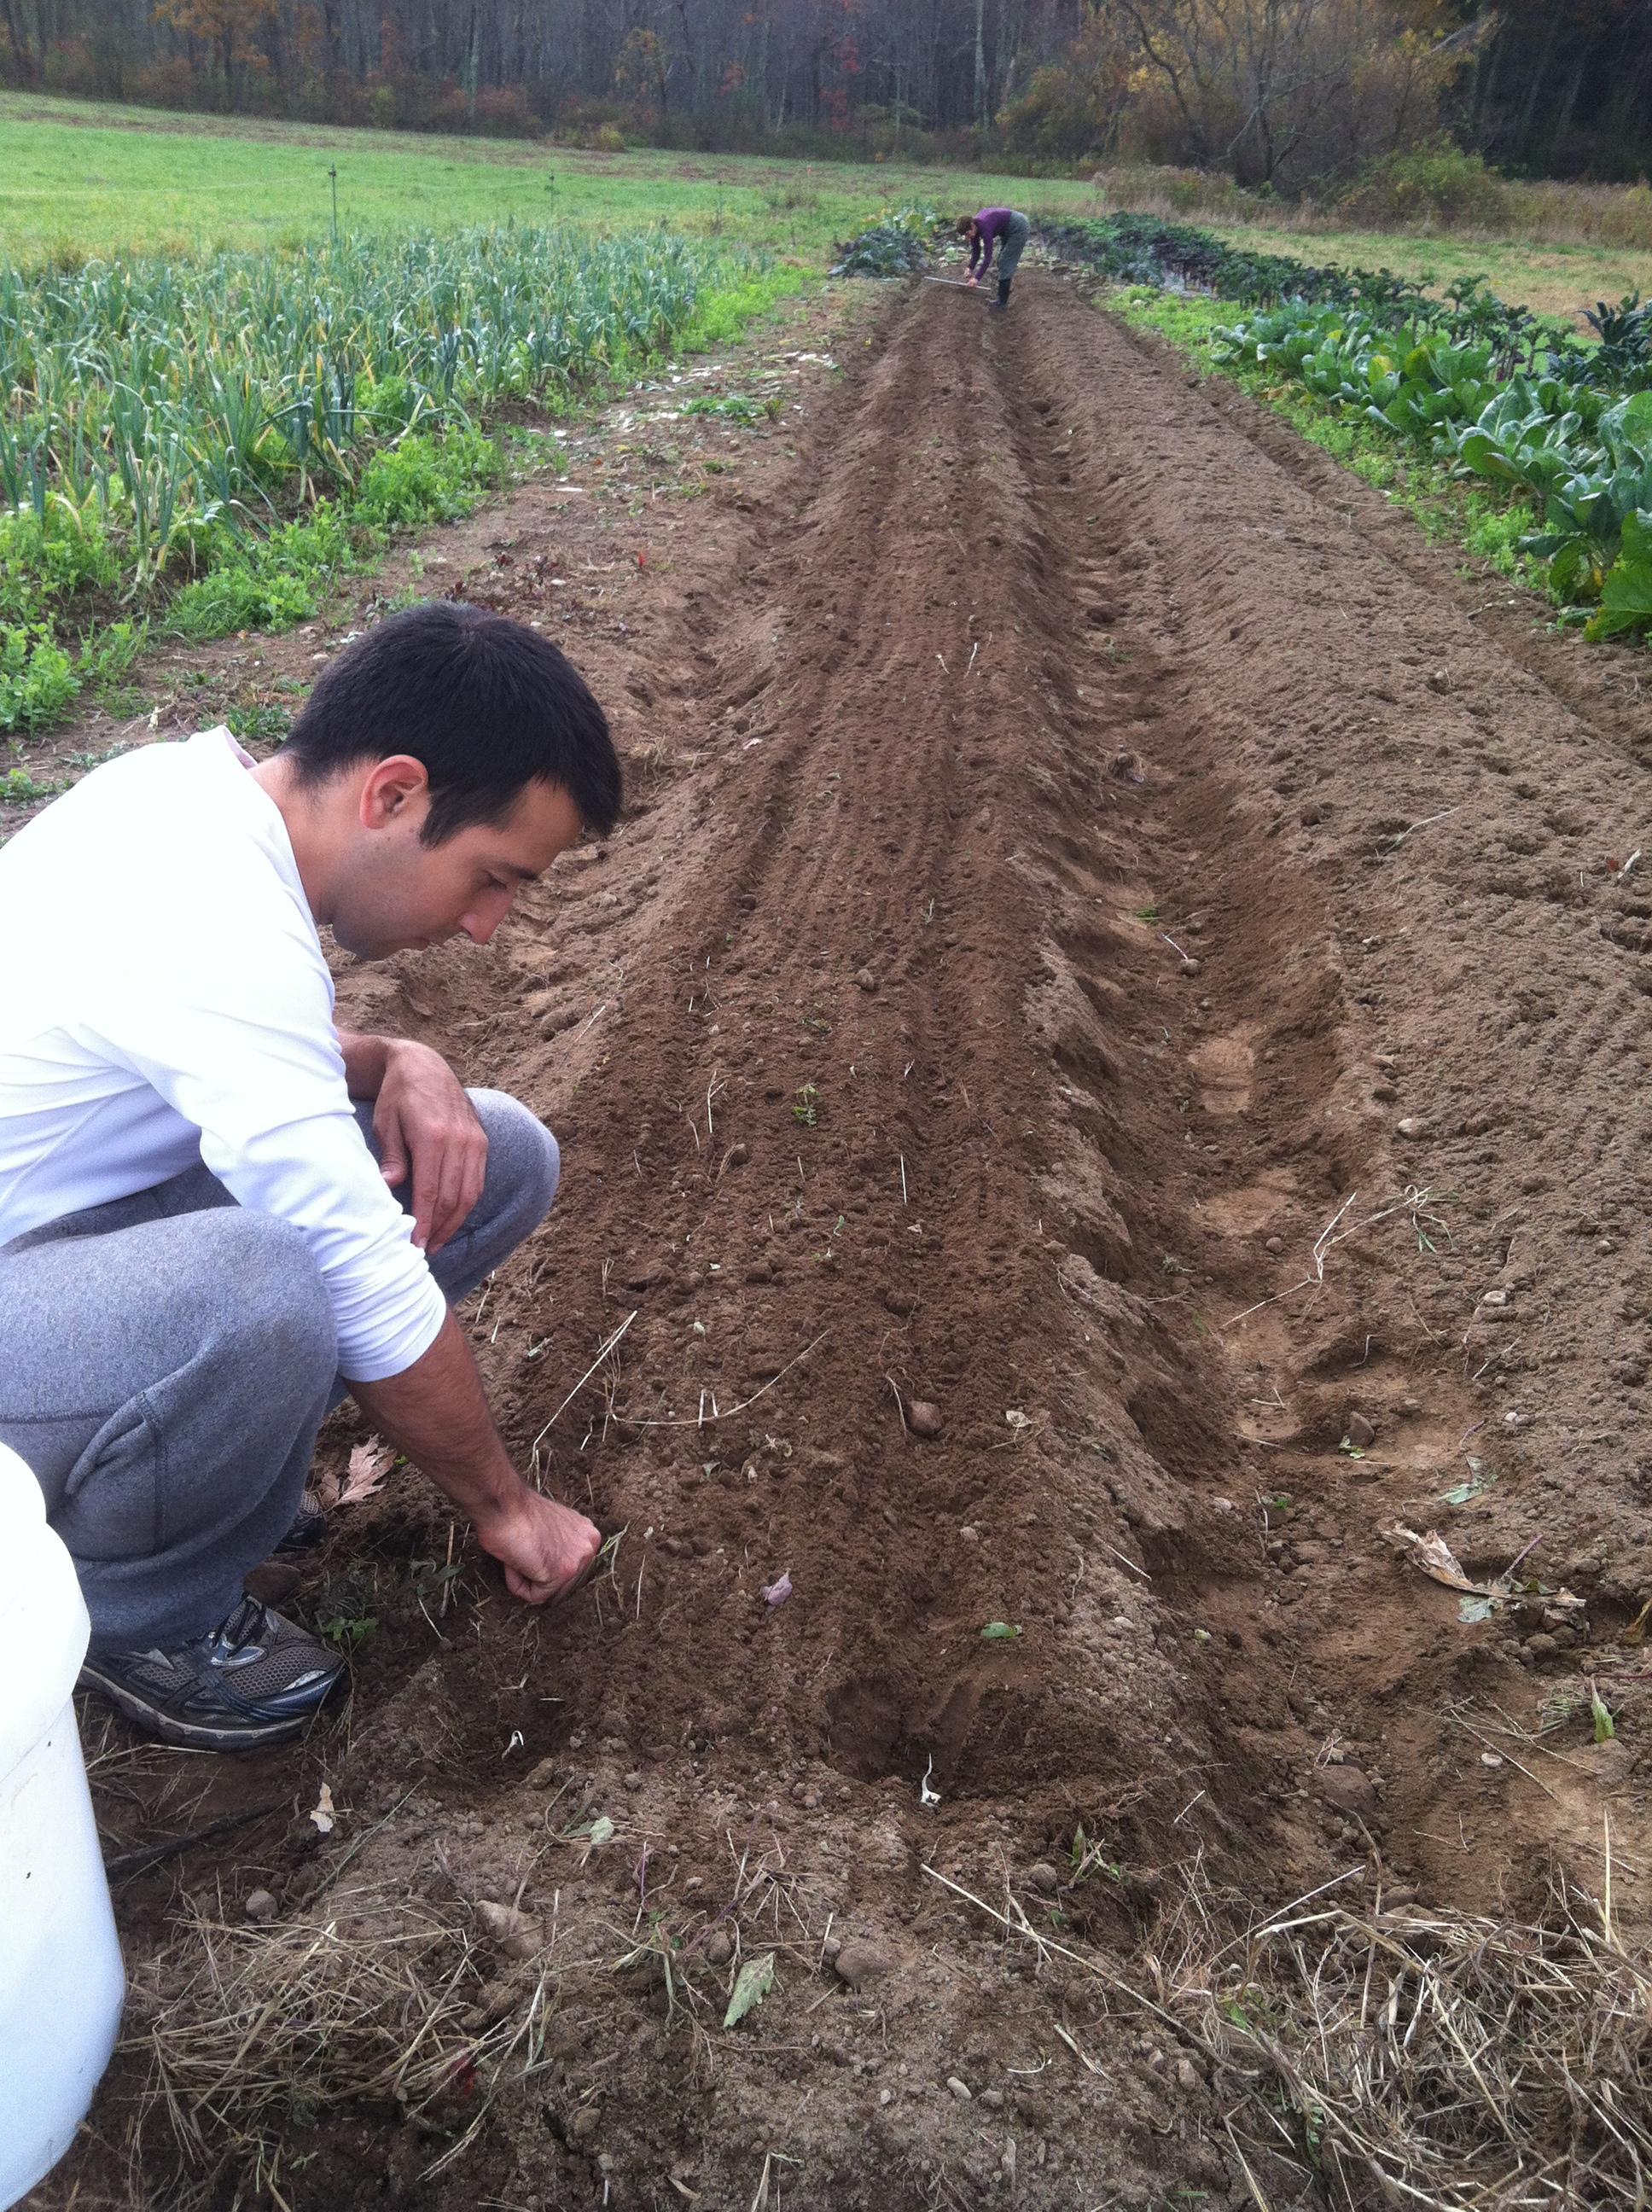 Curtis planting cloves